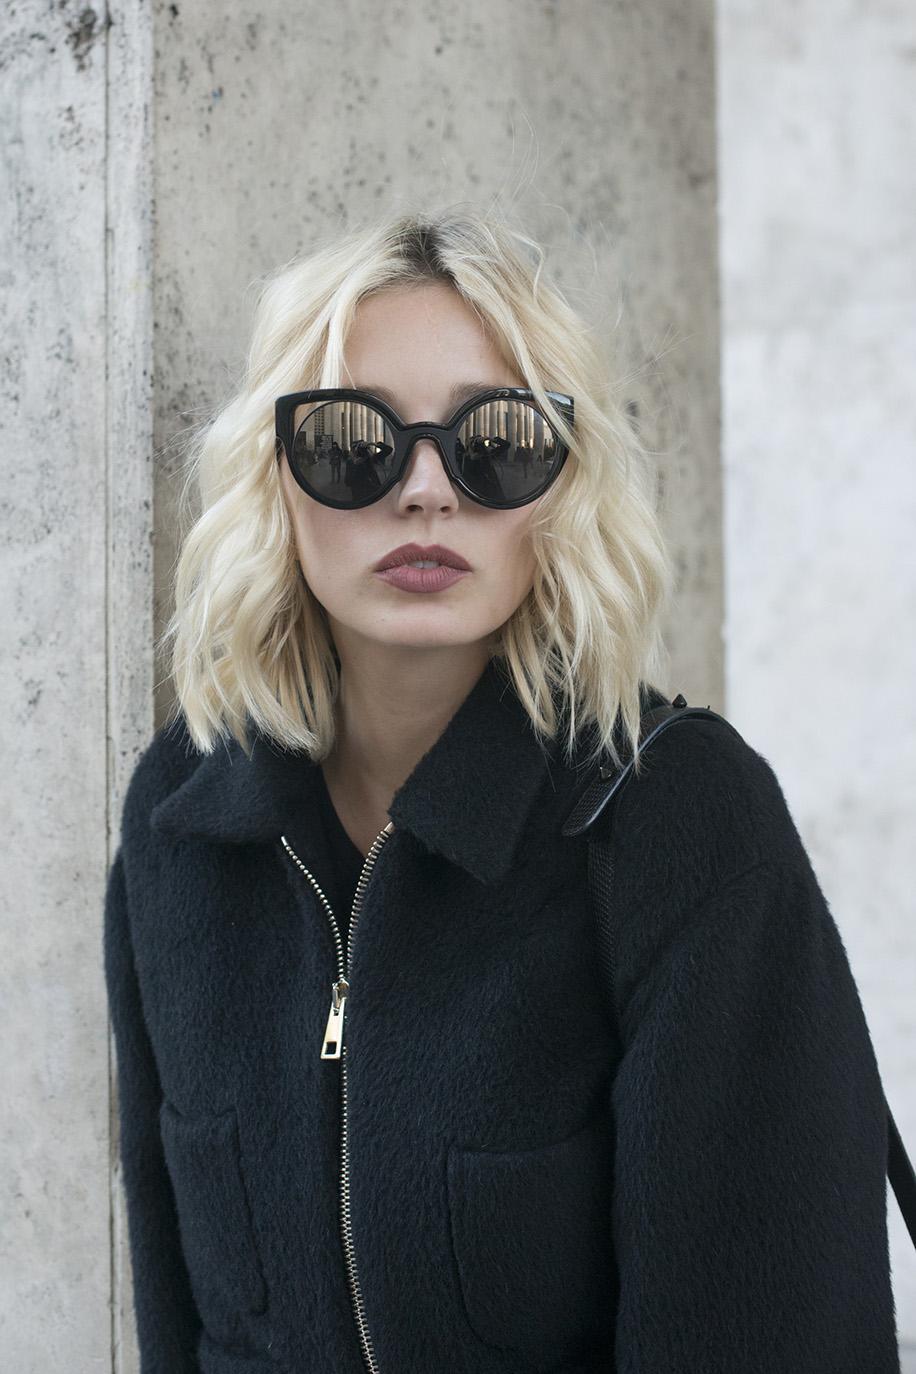 Caroline Vreeland at Paris Fashion Week. Photo: Kirstin Sinclair/Getty Images